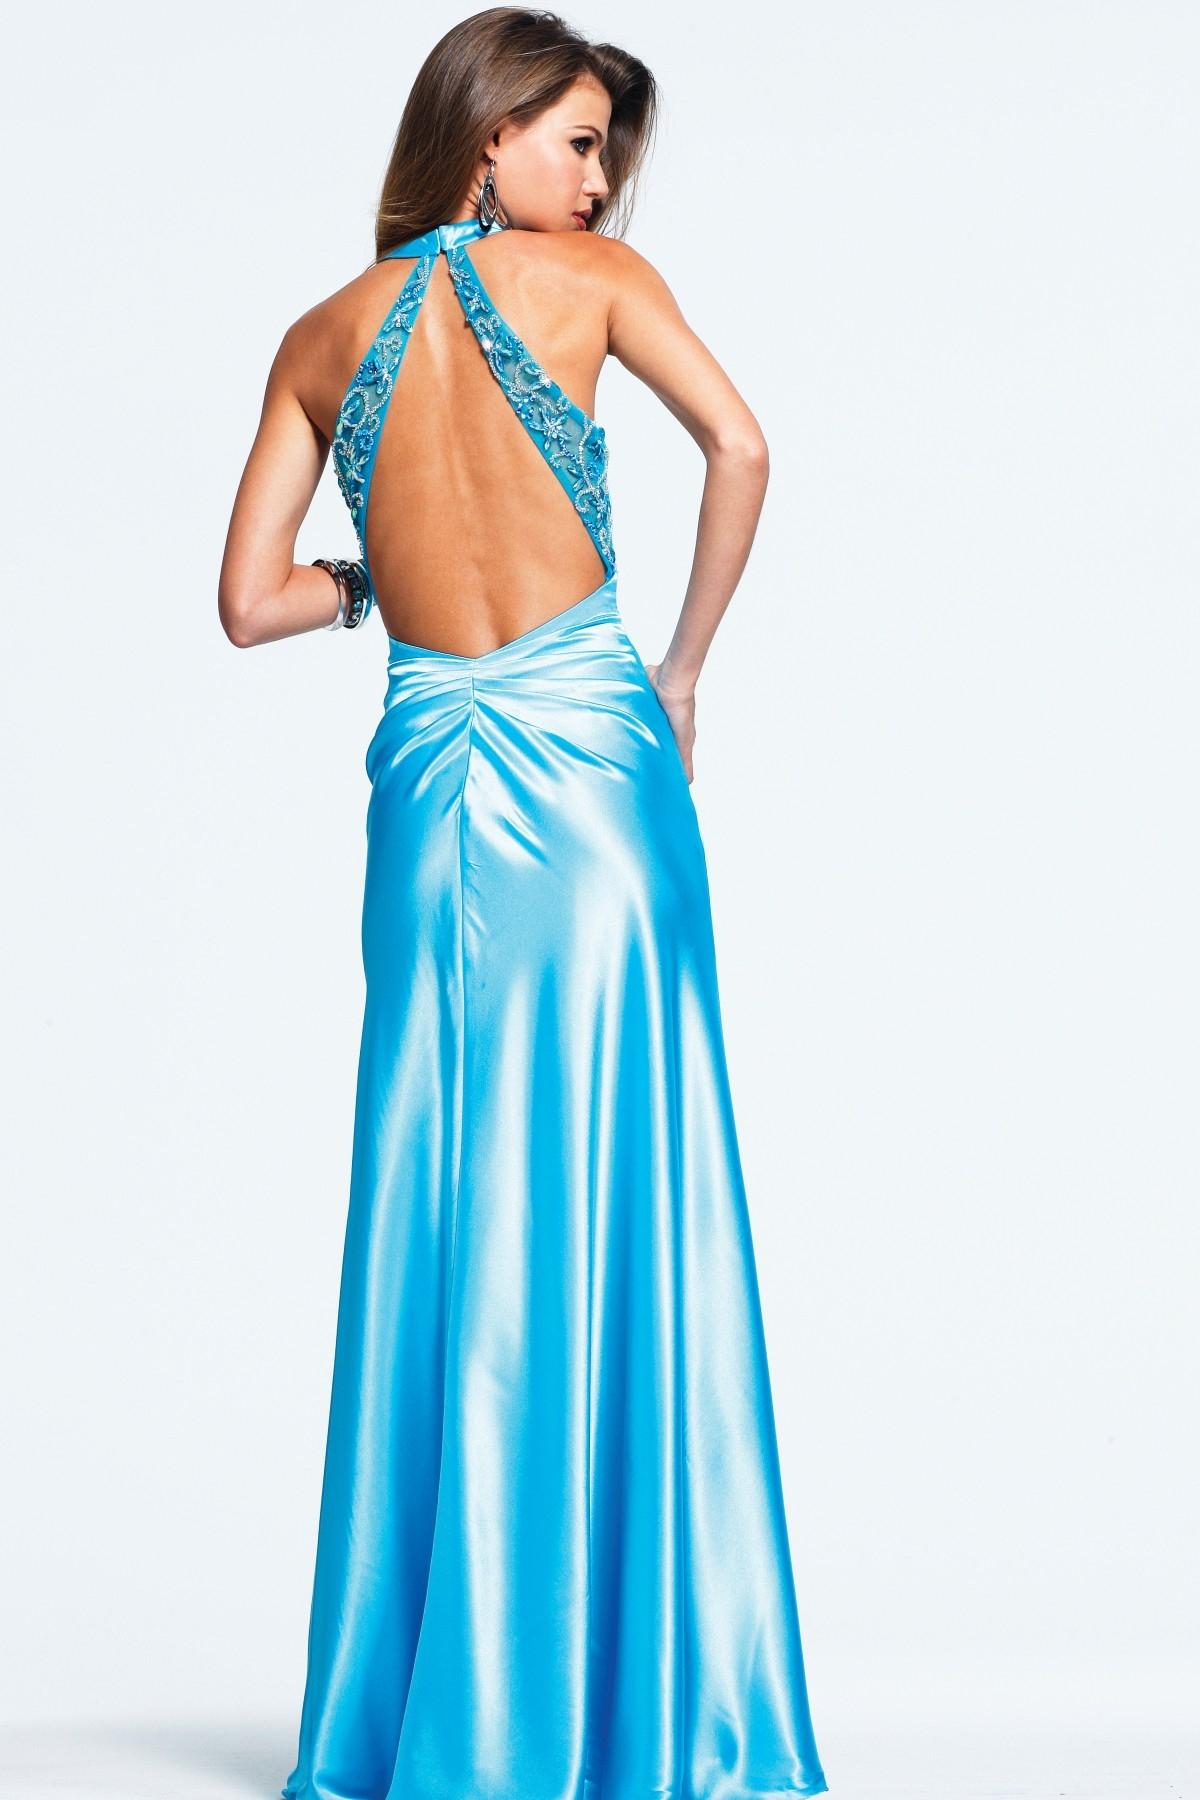 Dorable Prom Dresses Maryland Crest - All Wedding Dresses ...